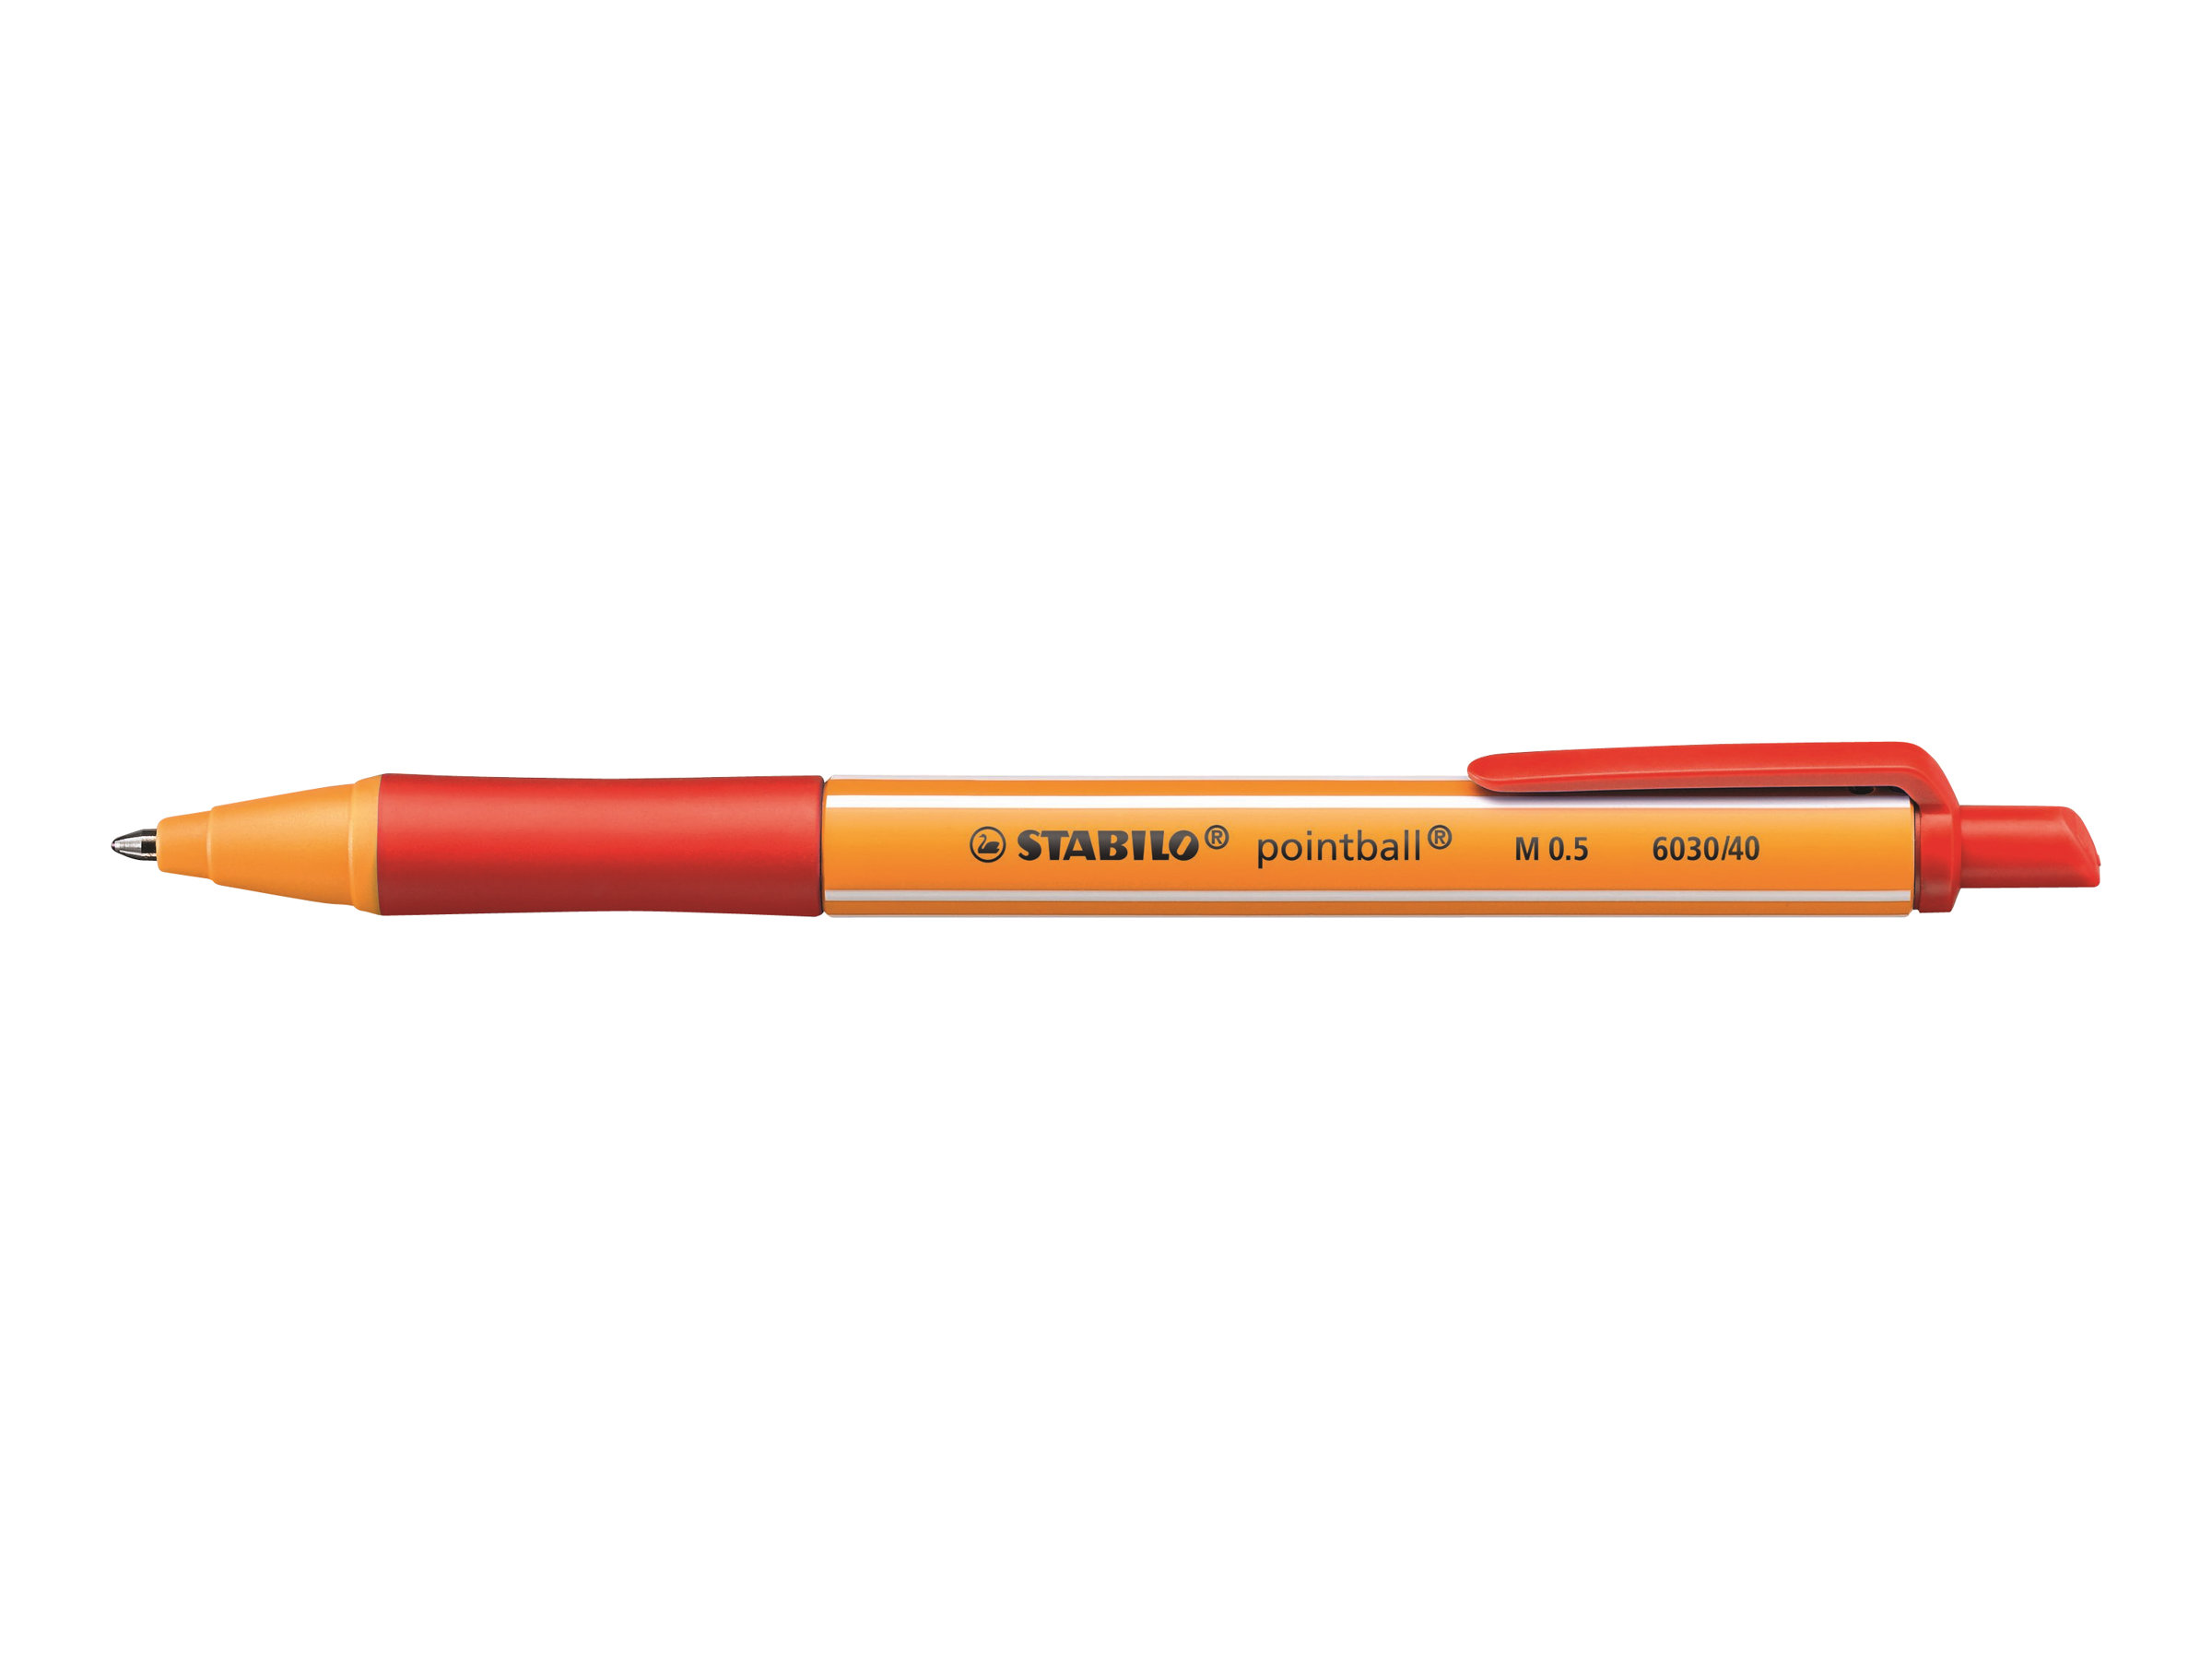 stylo 0.5mm